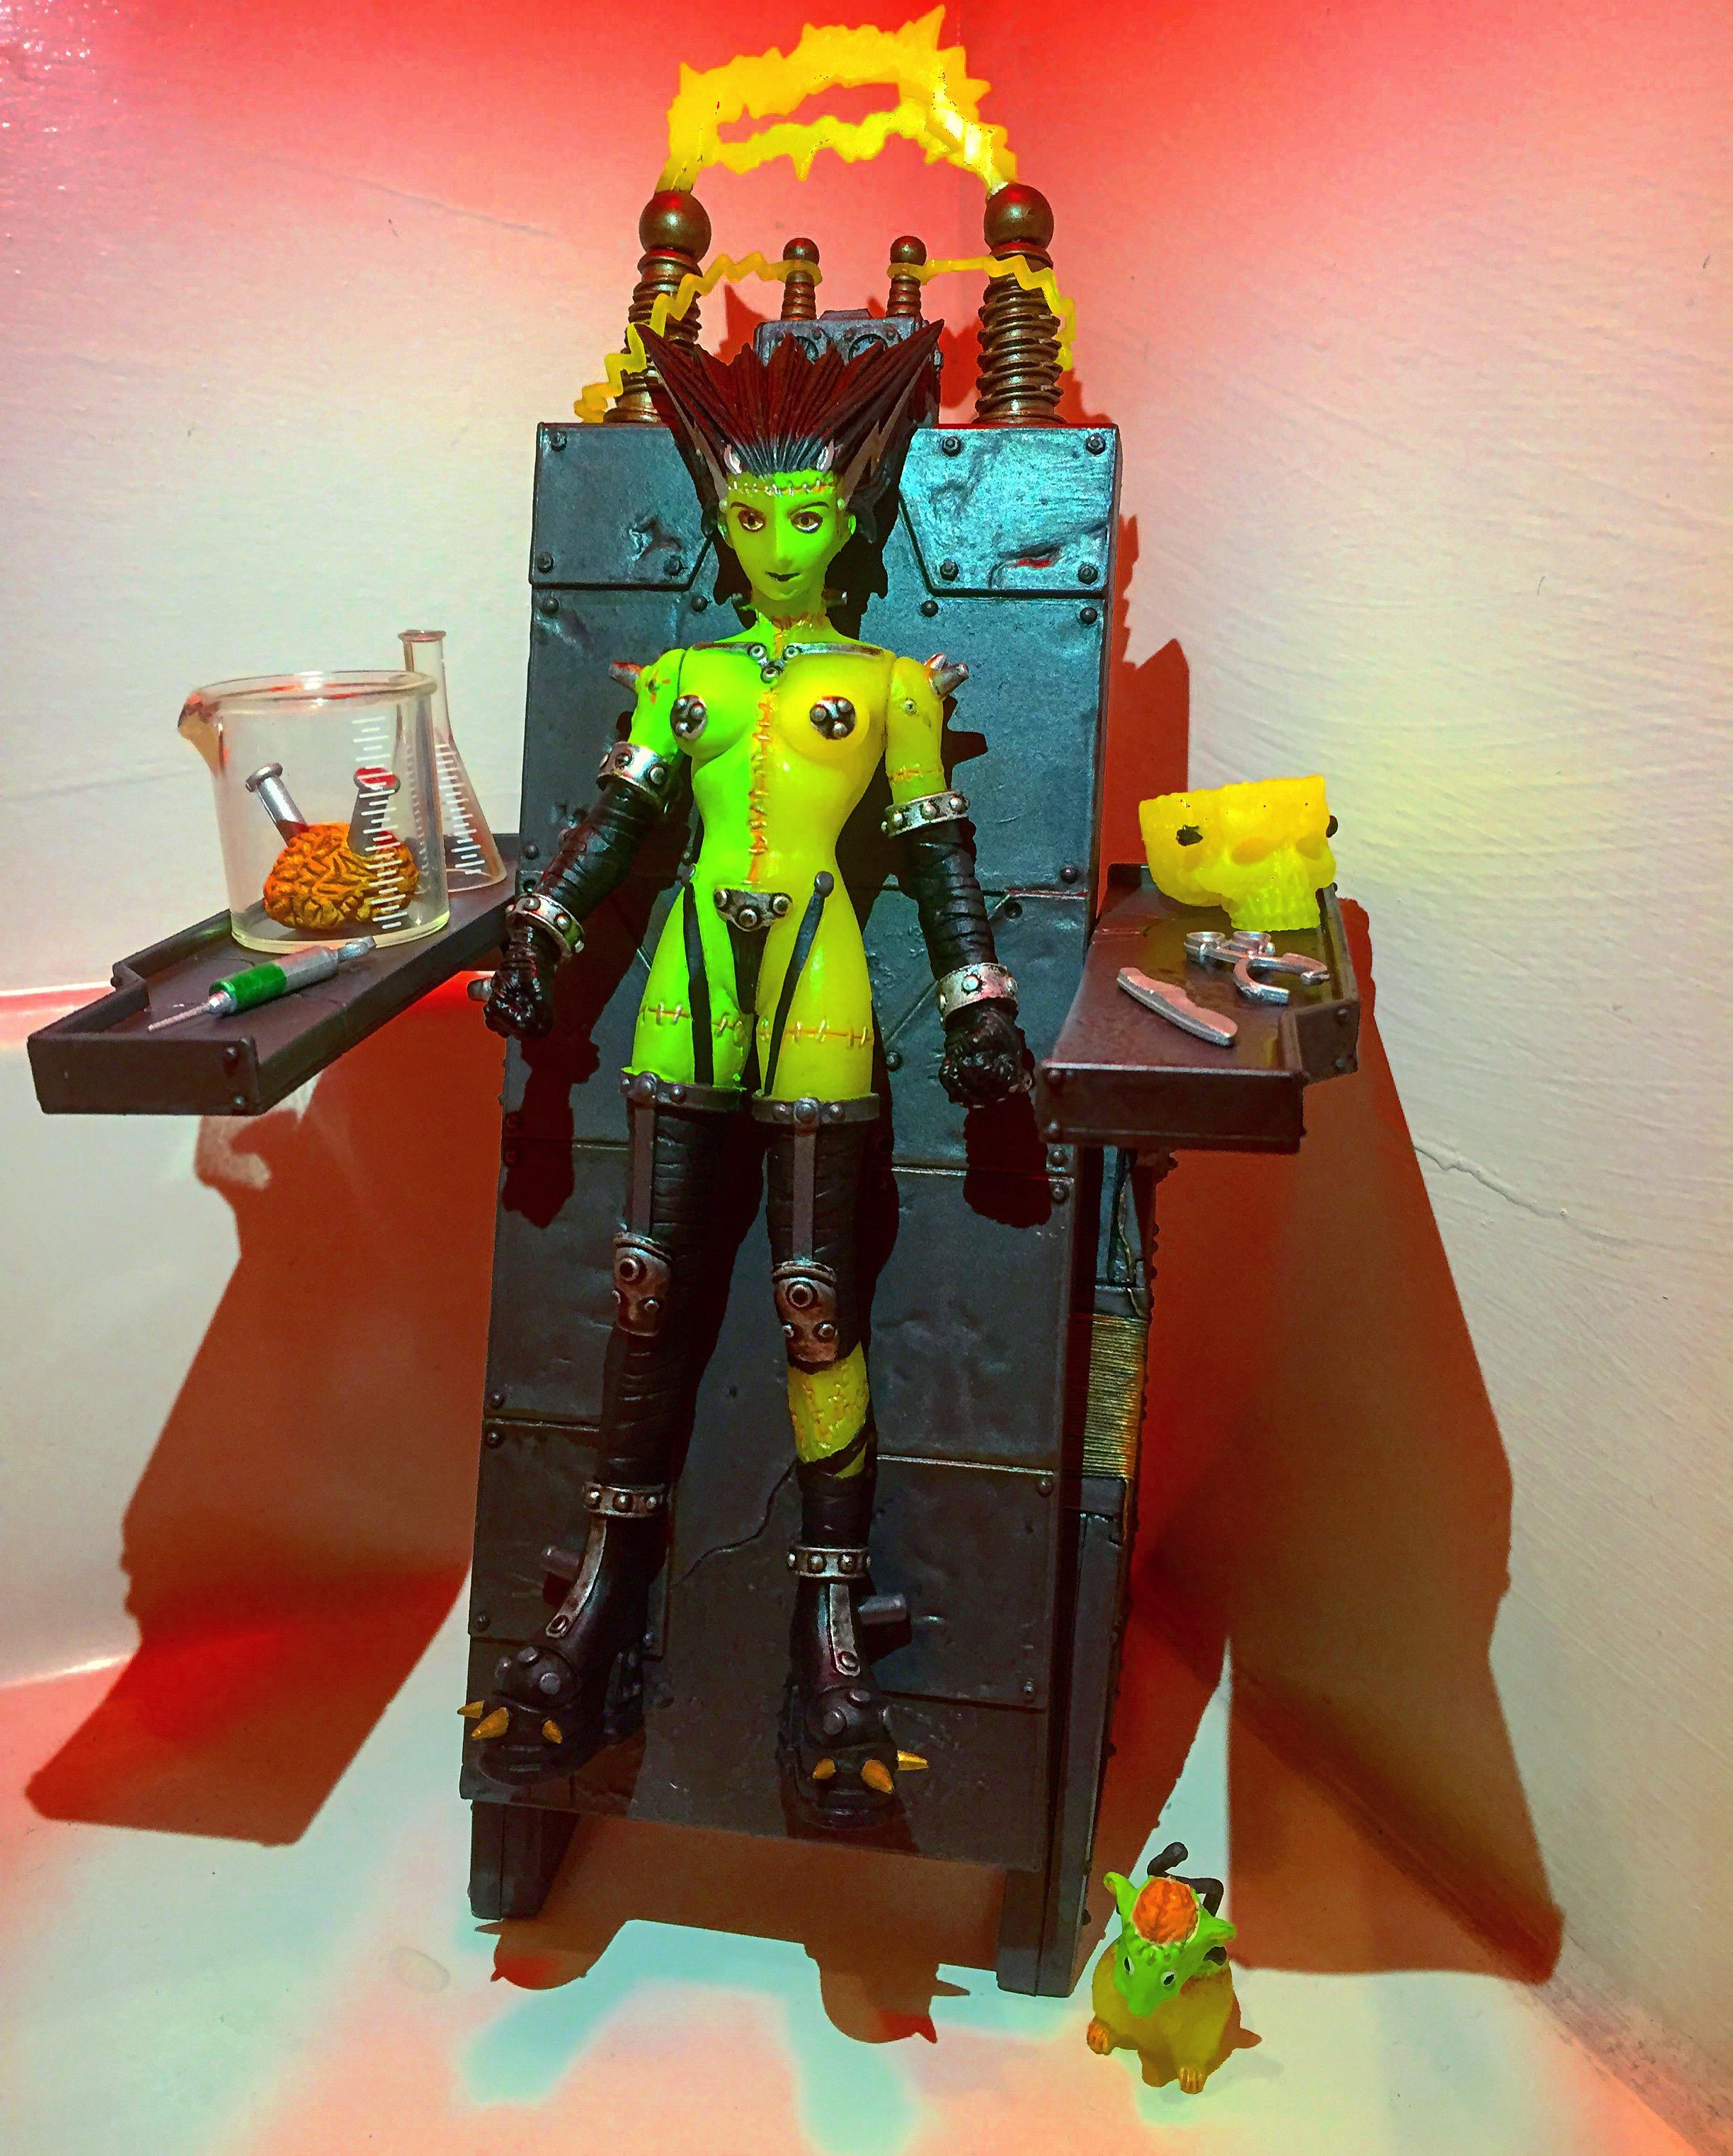 Résurrection de Monstress Wolfinica figurine Yasushi Nirasawa